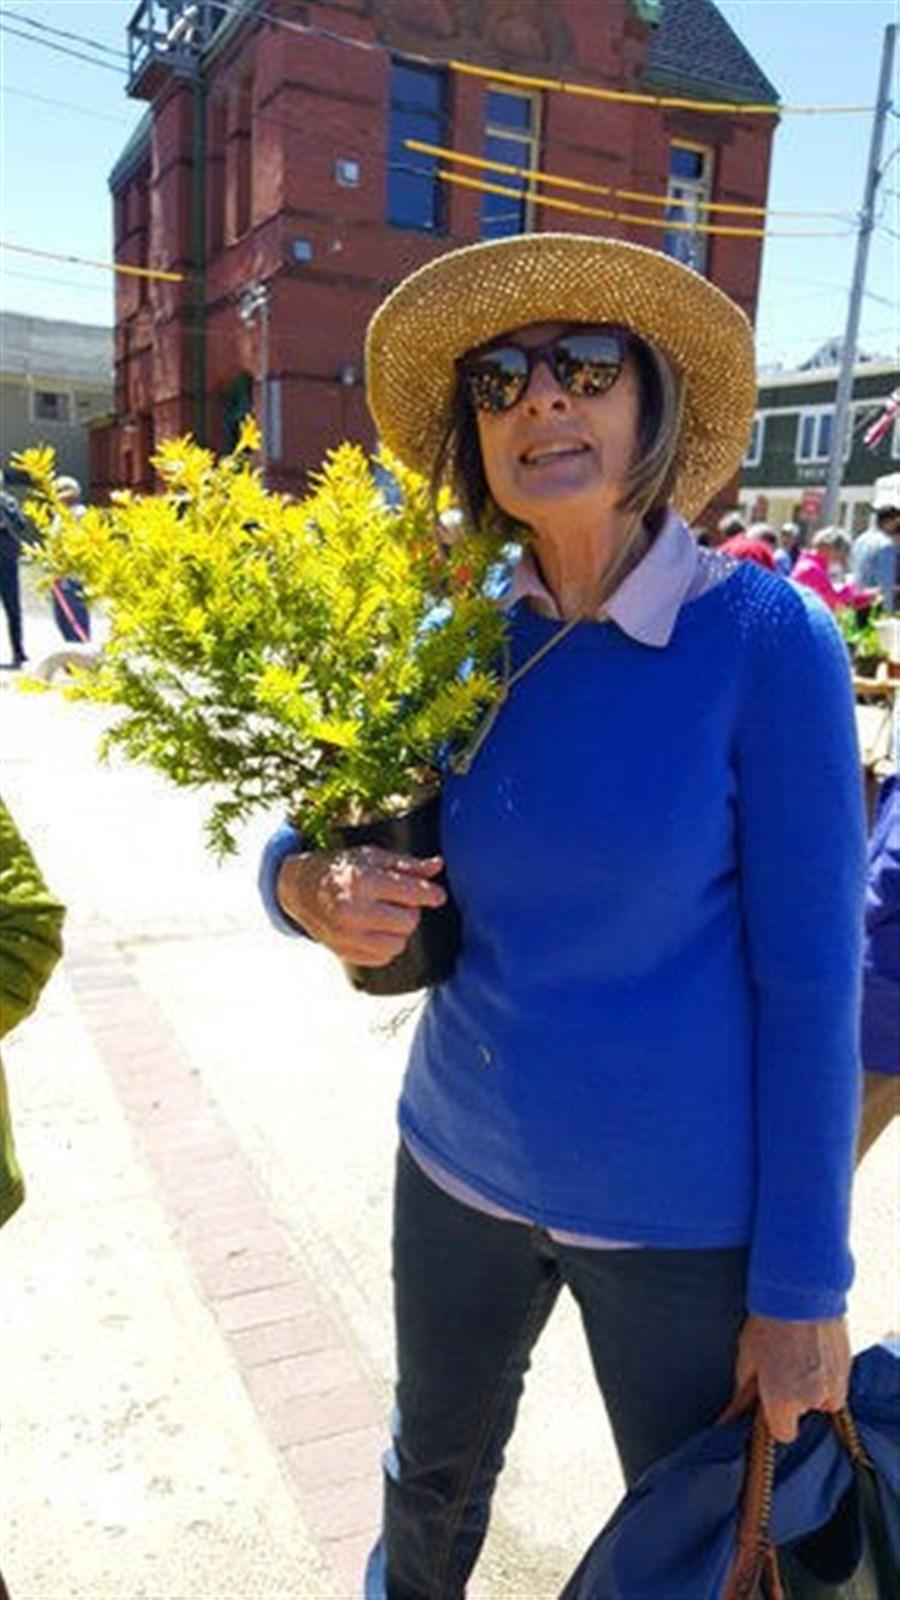 Rare and unusual plant sale's a draw for Nova Scotia town